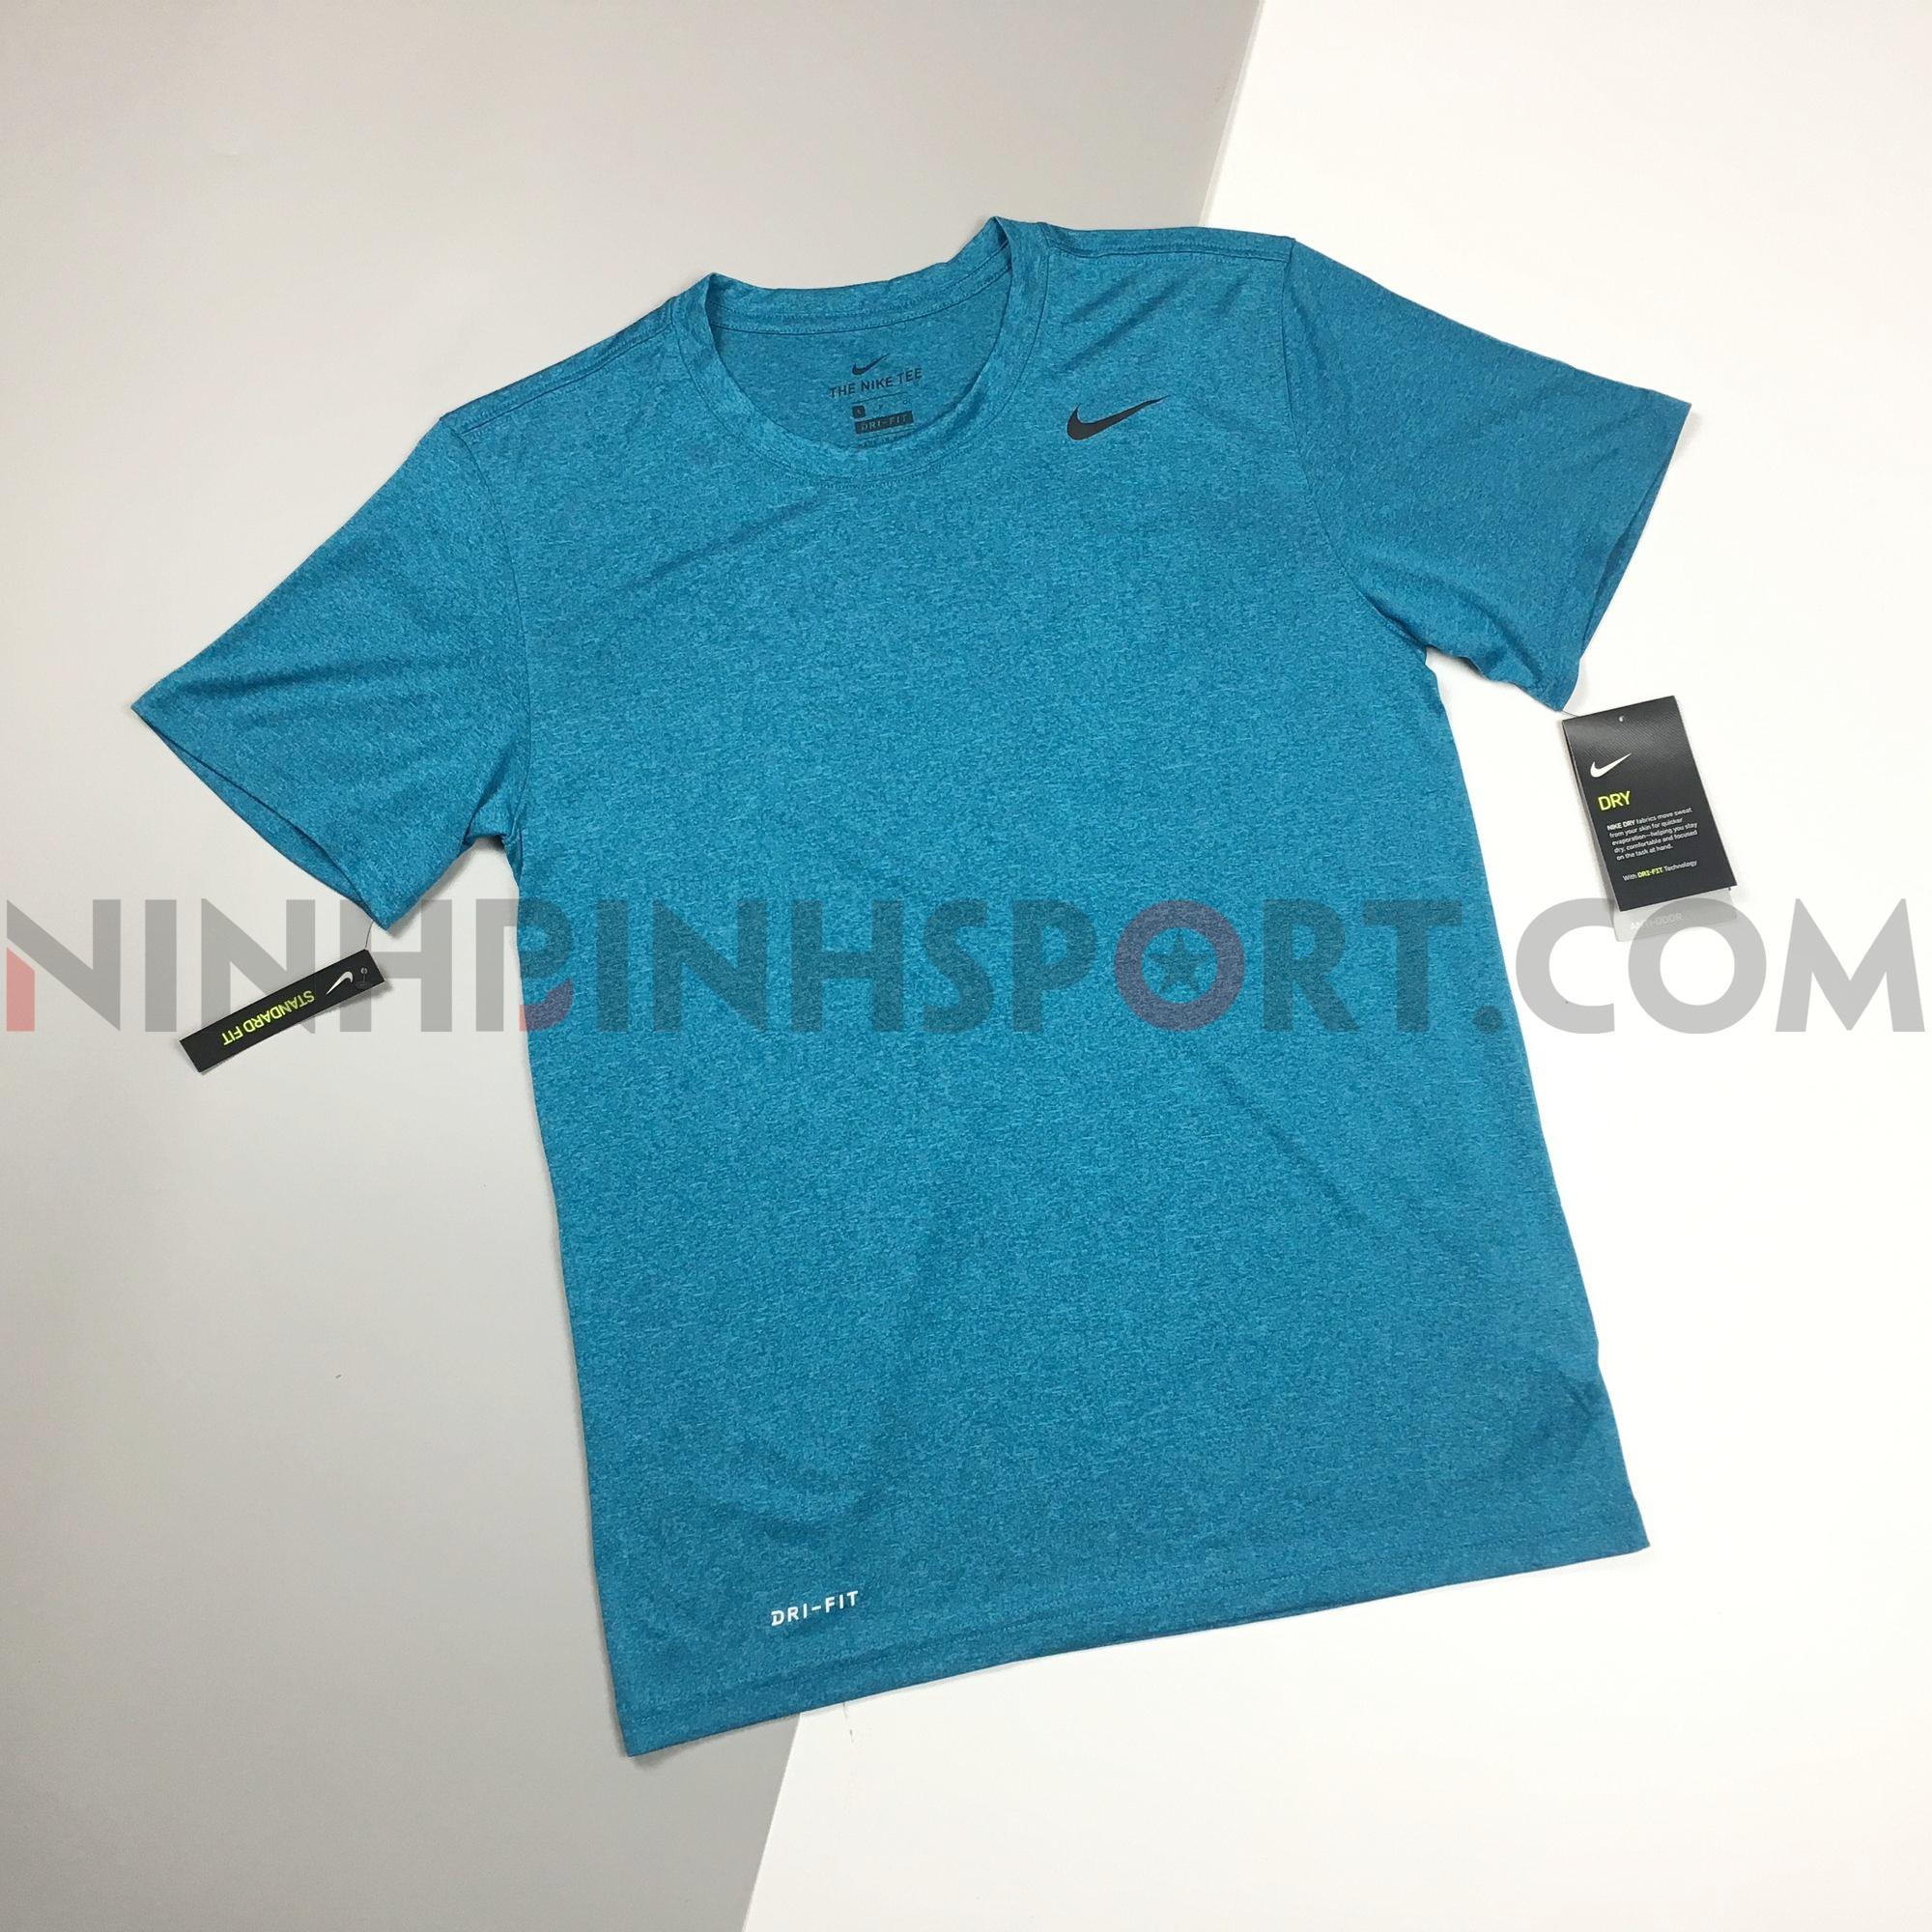 Áo thể thao nam Nike Dri-Fit Legend 2.0 Blue 718834-305